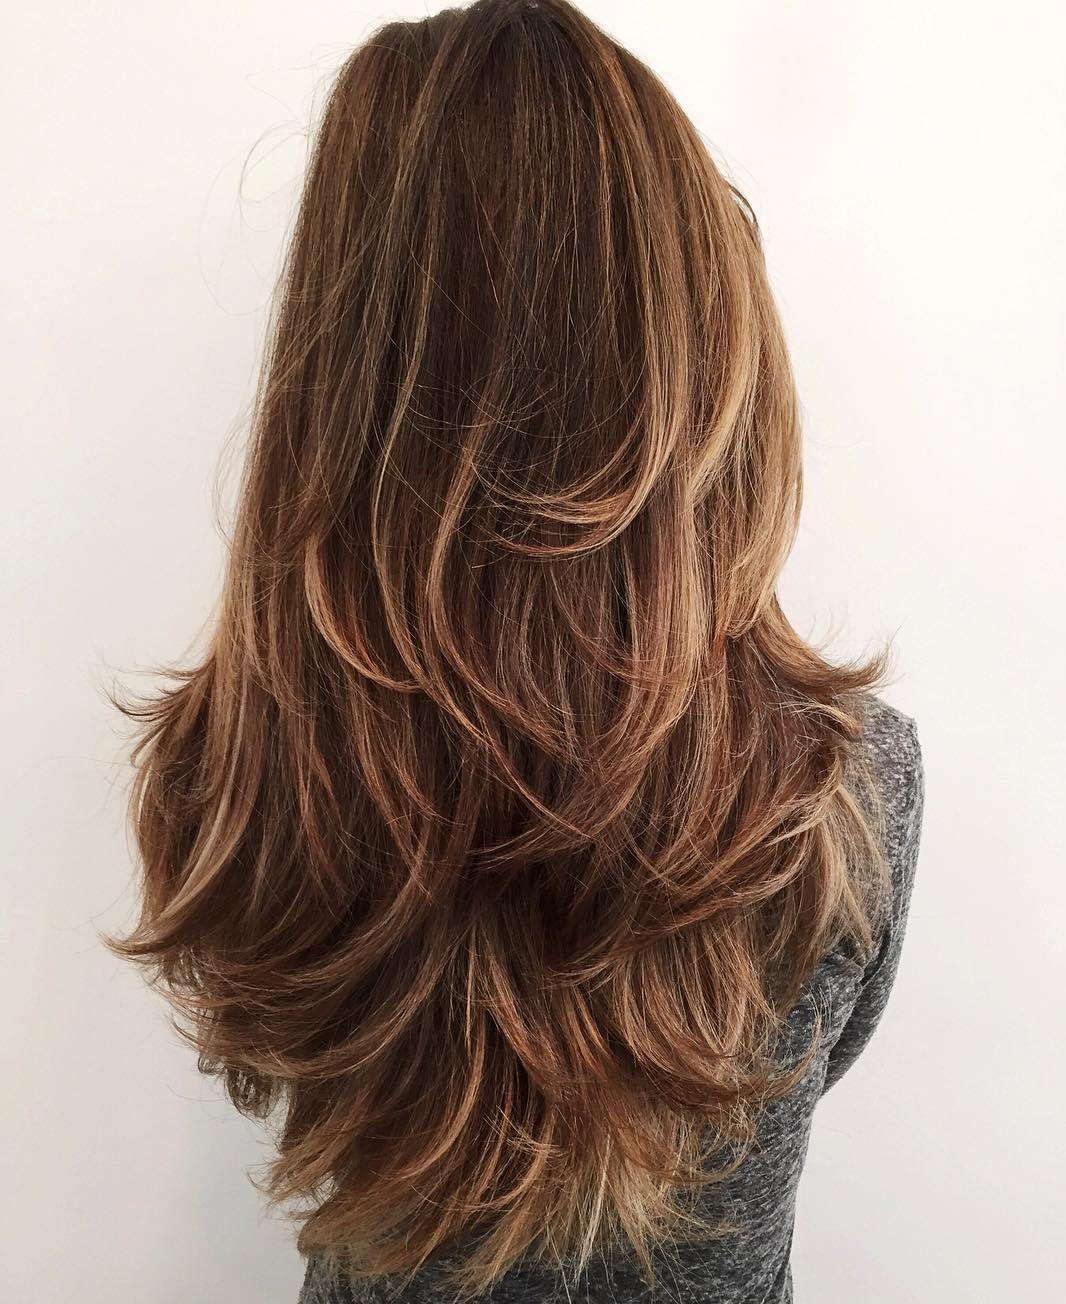 50 lovely long shag haircuts for effortless stylish looks | frisuren